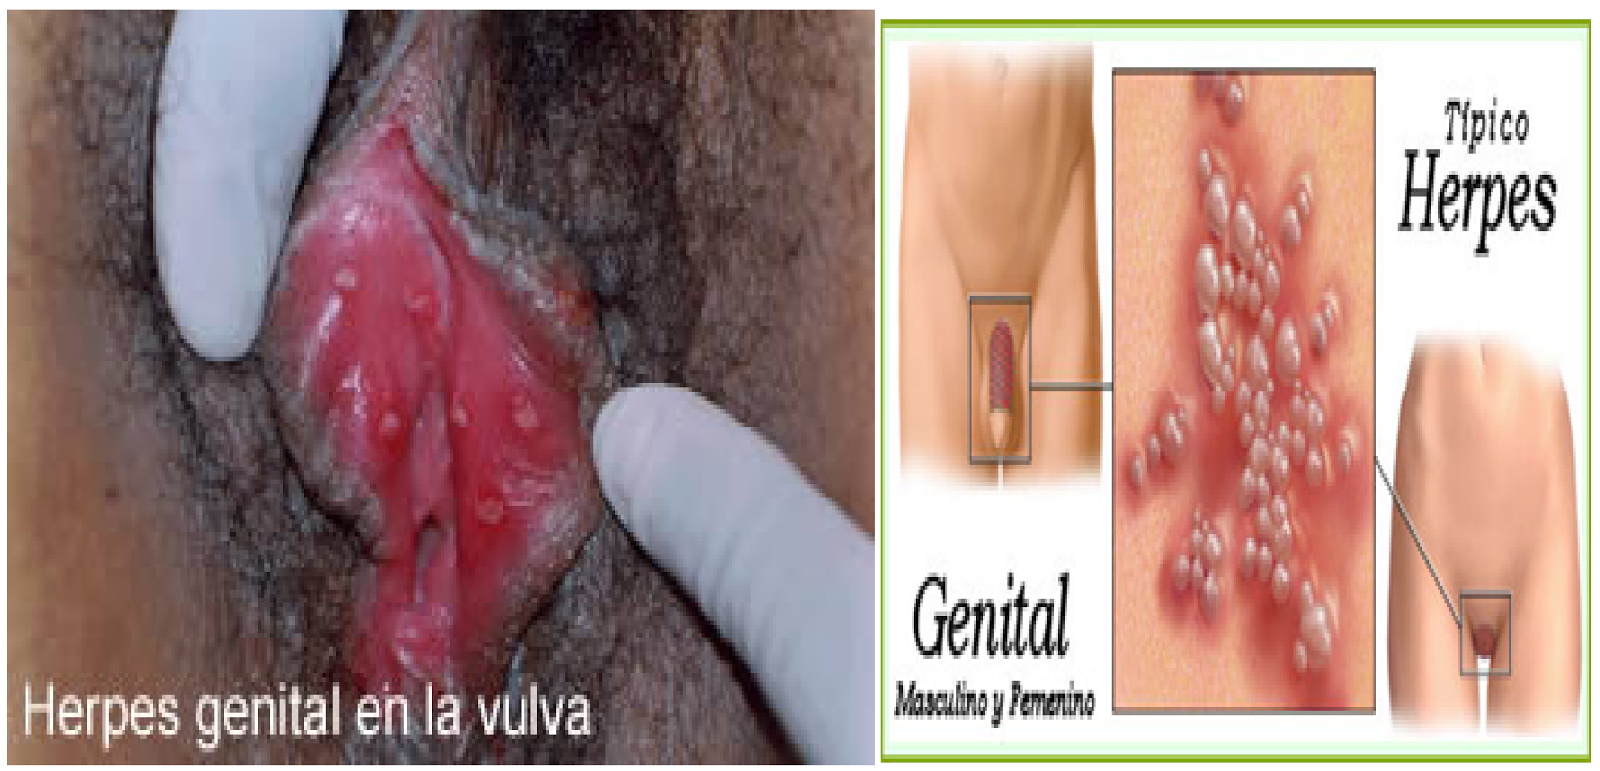 del Herpes Zóster; Herpesvirus varicellae; Herpesvirus Humano Tipo ...